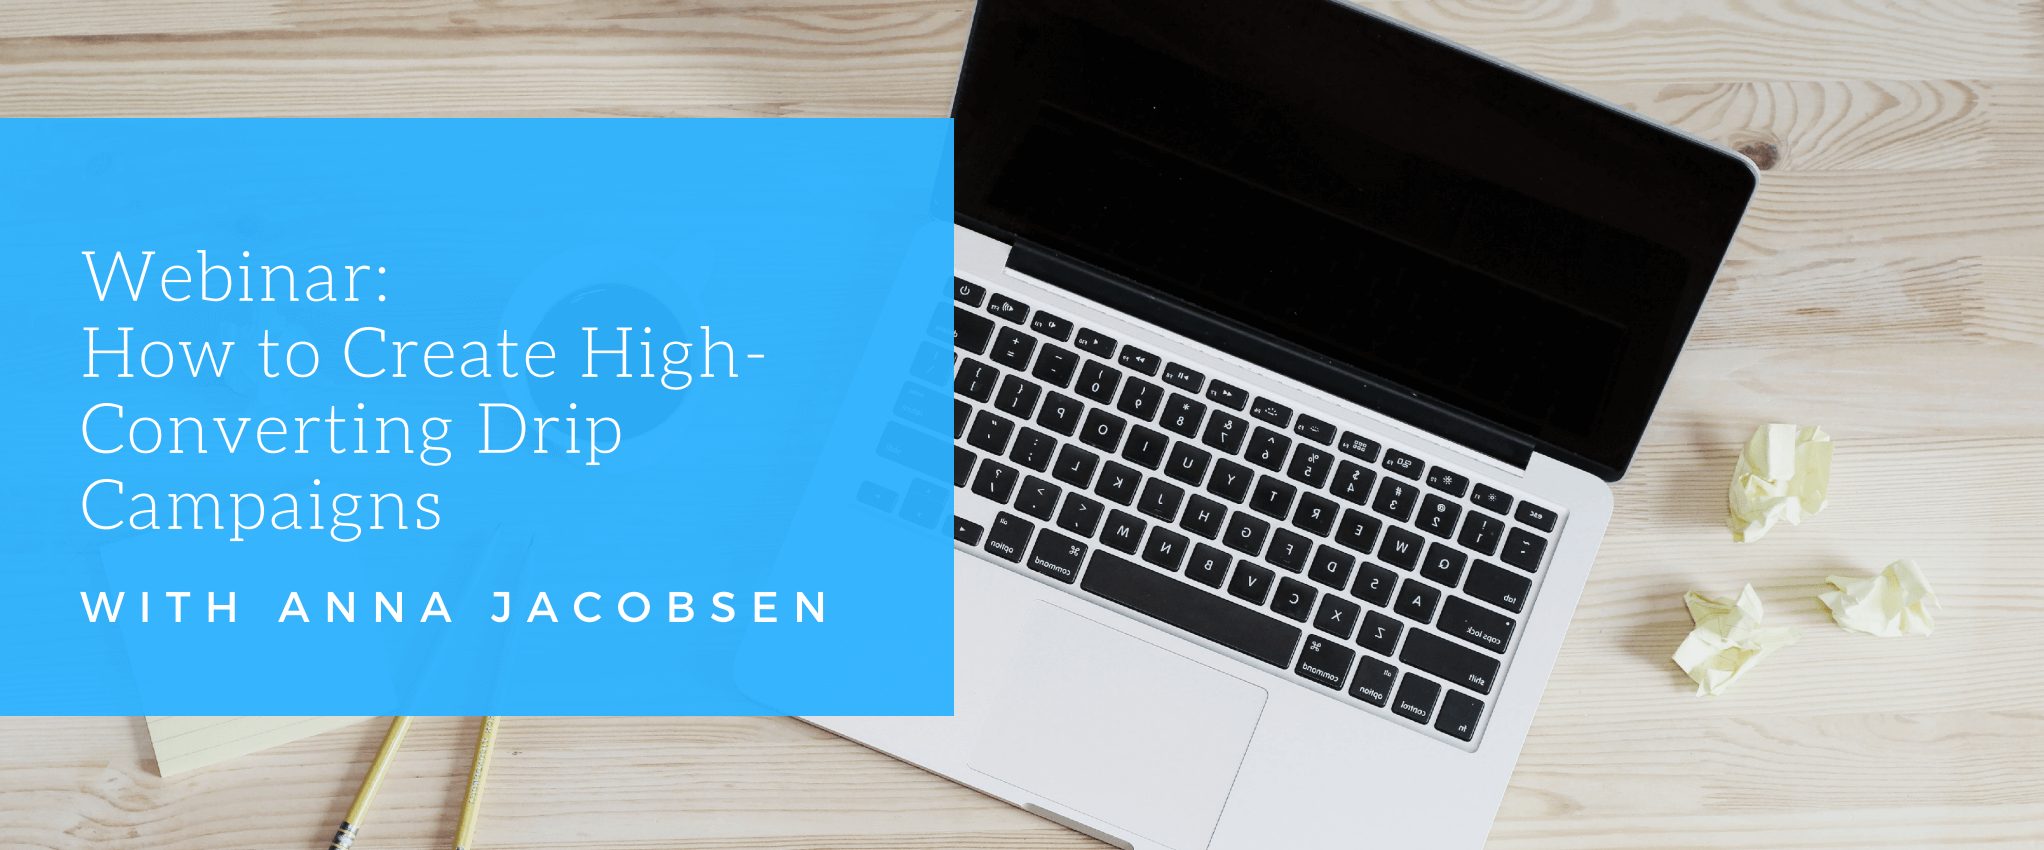 How to Create High-Converting Drip Campaigns [Webinar]